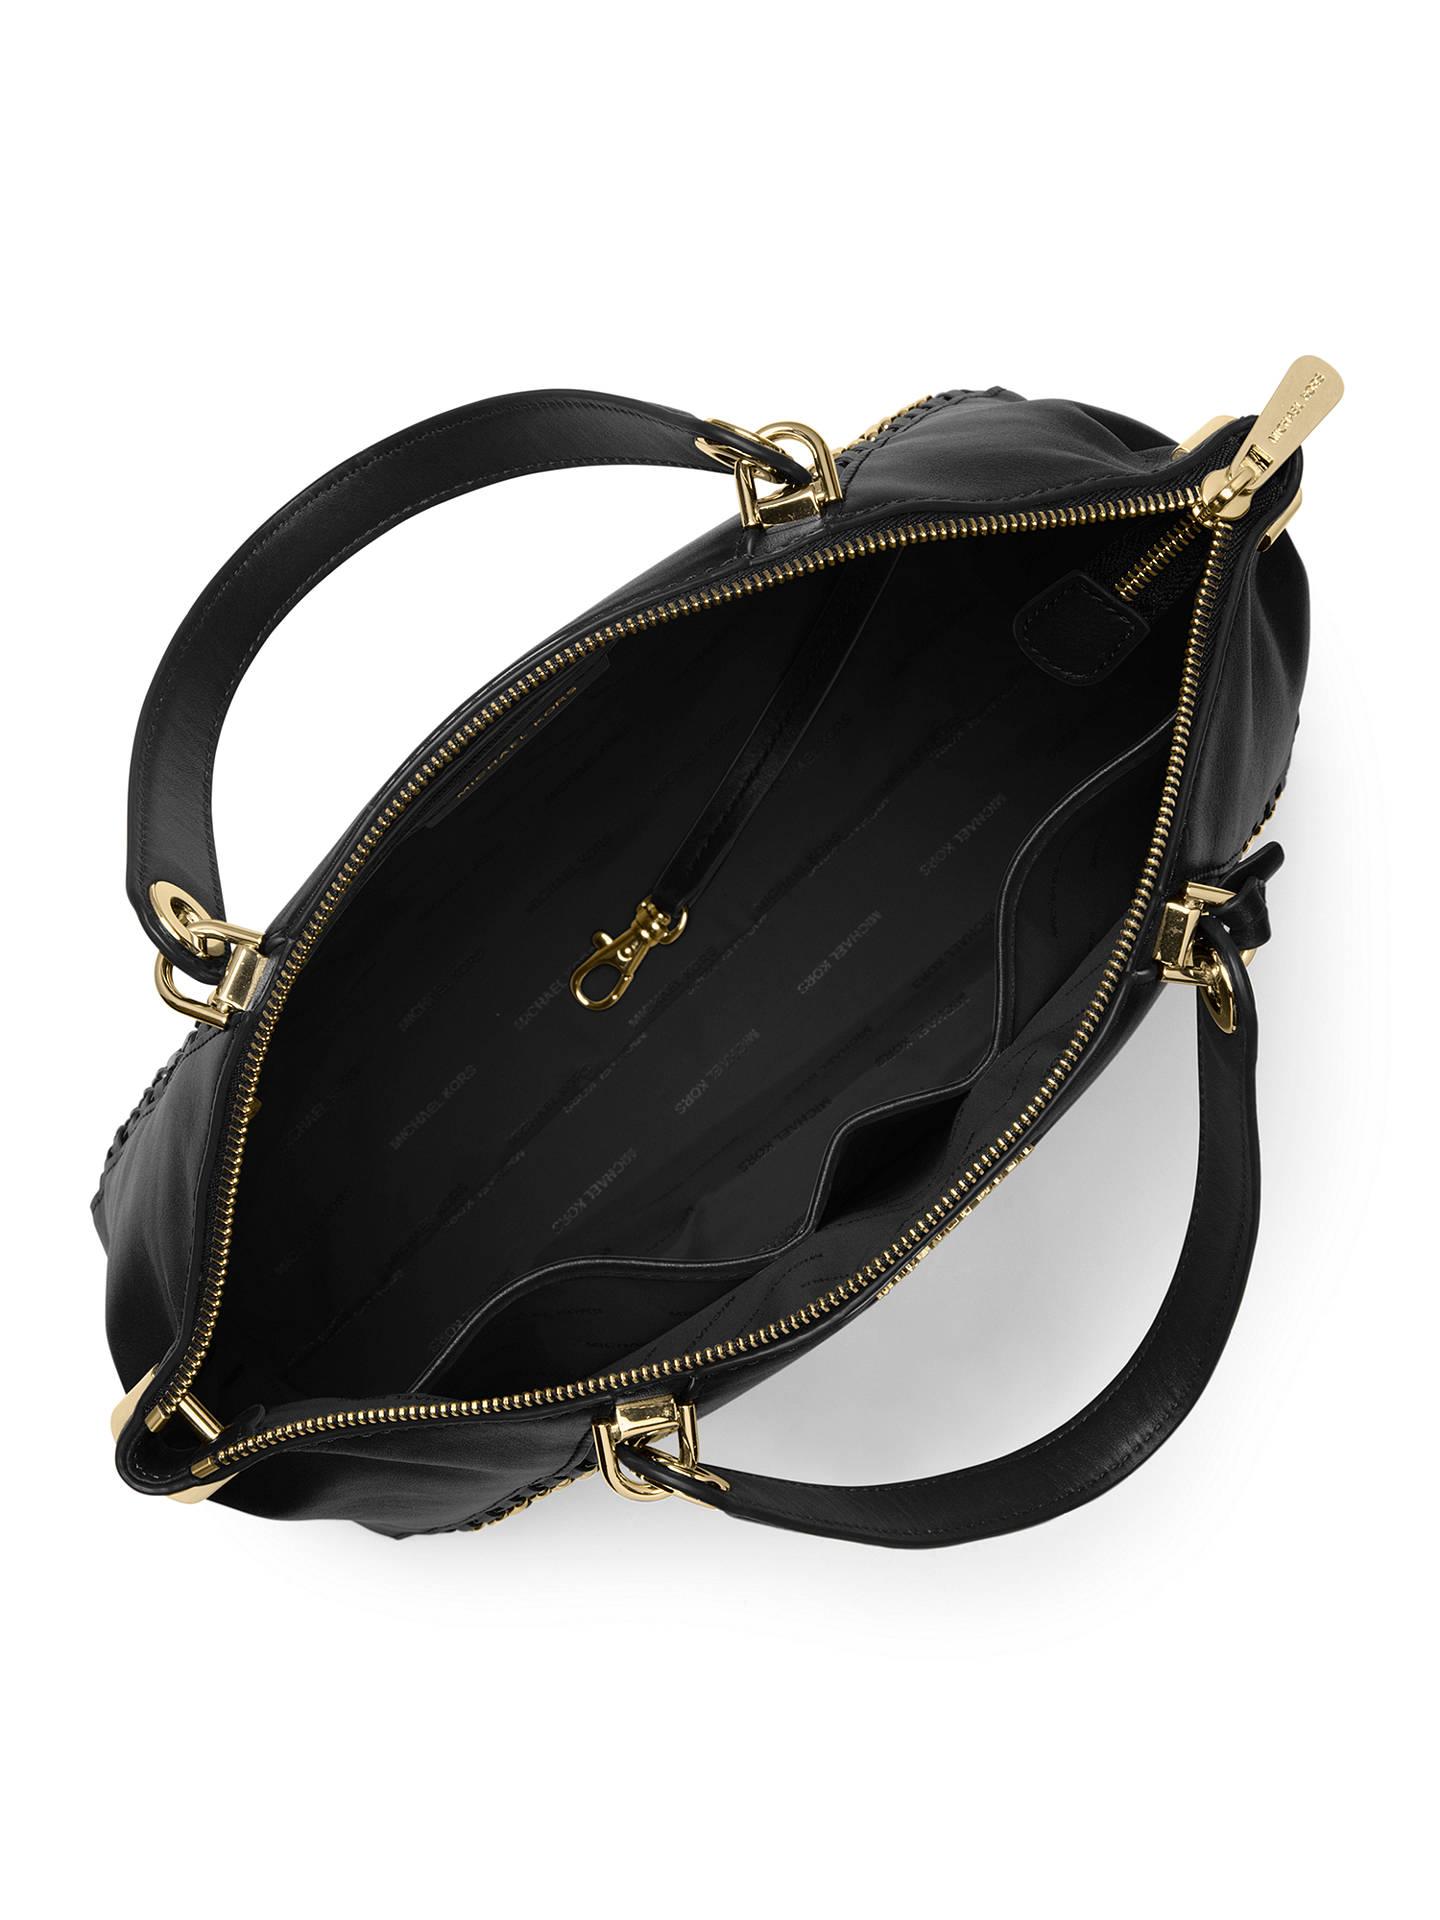 239419a797479c ... Buy MICHAEL Michael Kors Sadie Large Leather Satchel Bag, Black Online  at johnlewis.com ...